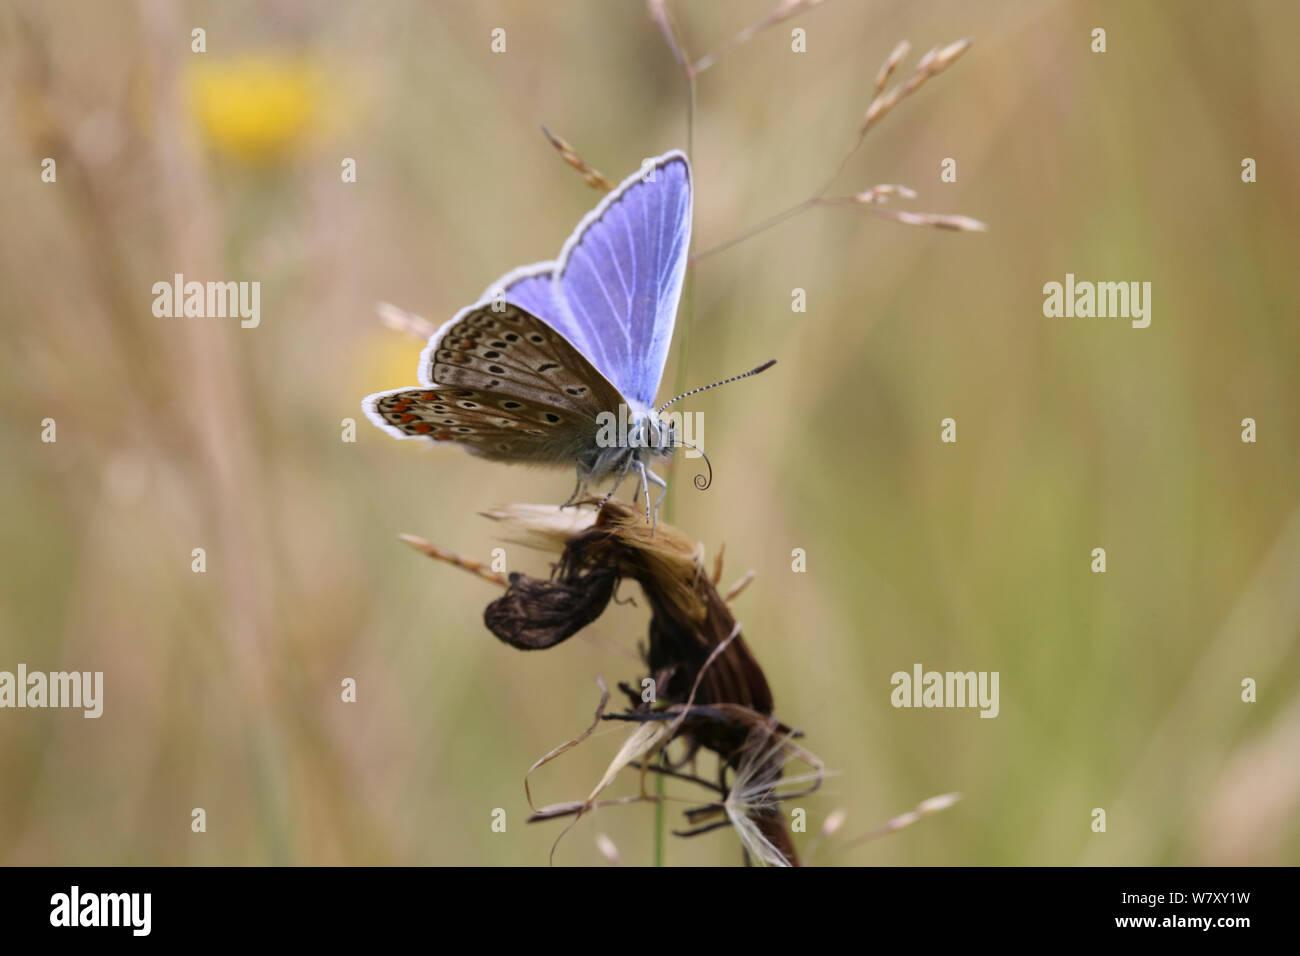 Mariposa Azul común (Polyommatus icarus) desenrollar la lengua, Surrey, Inglaterra, en julio. Foto de stock